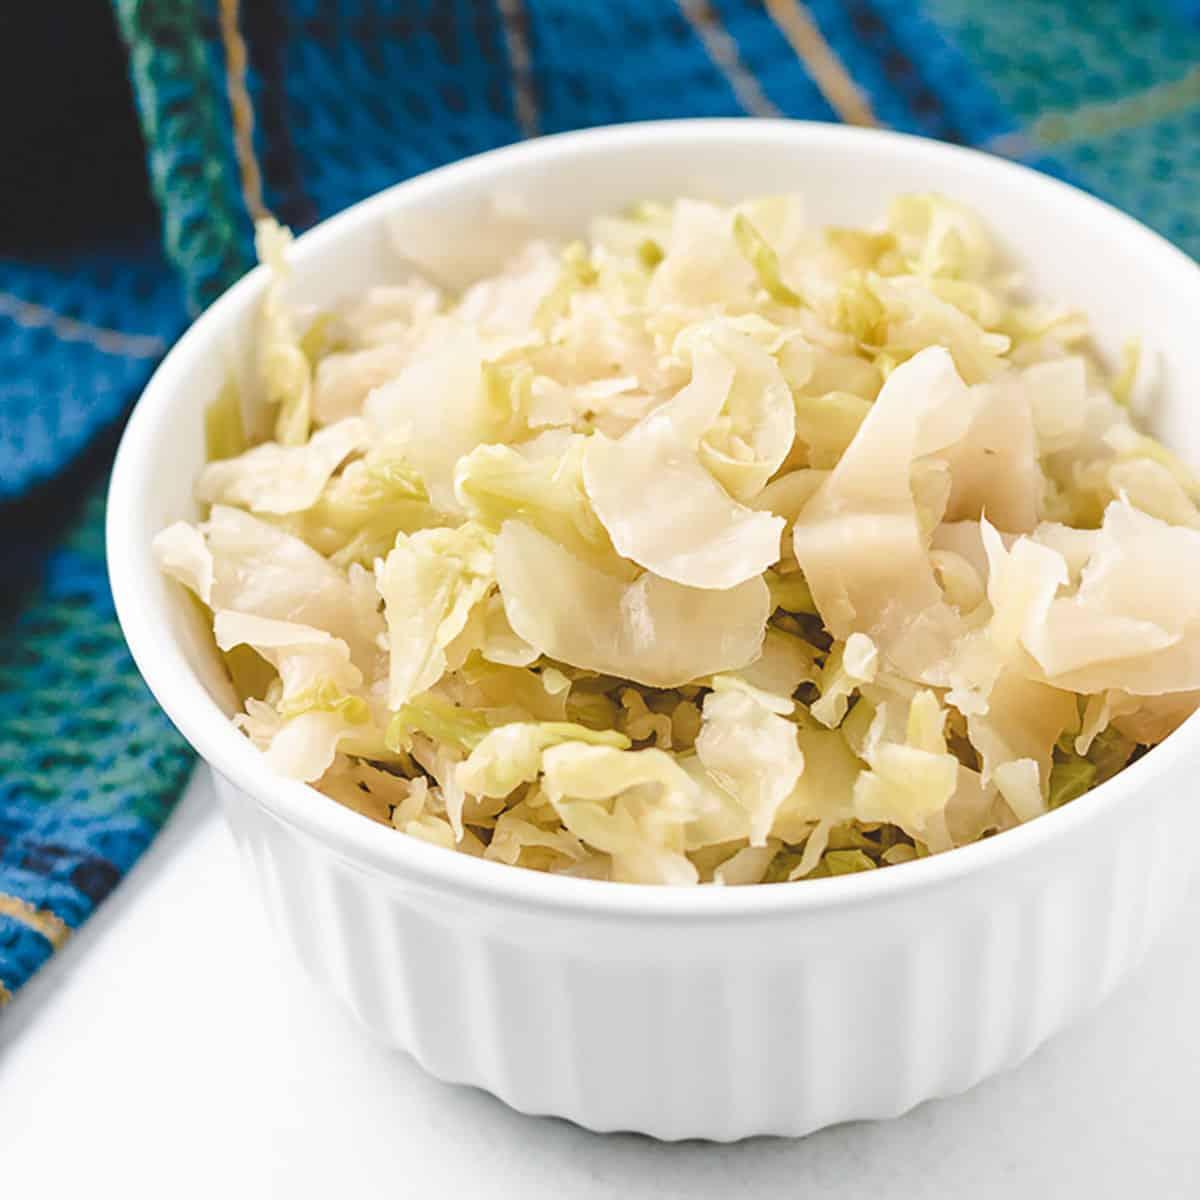 A small ramekin filed with the raw sauerkraut.